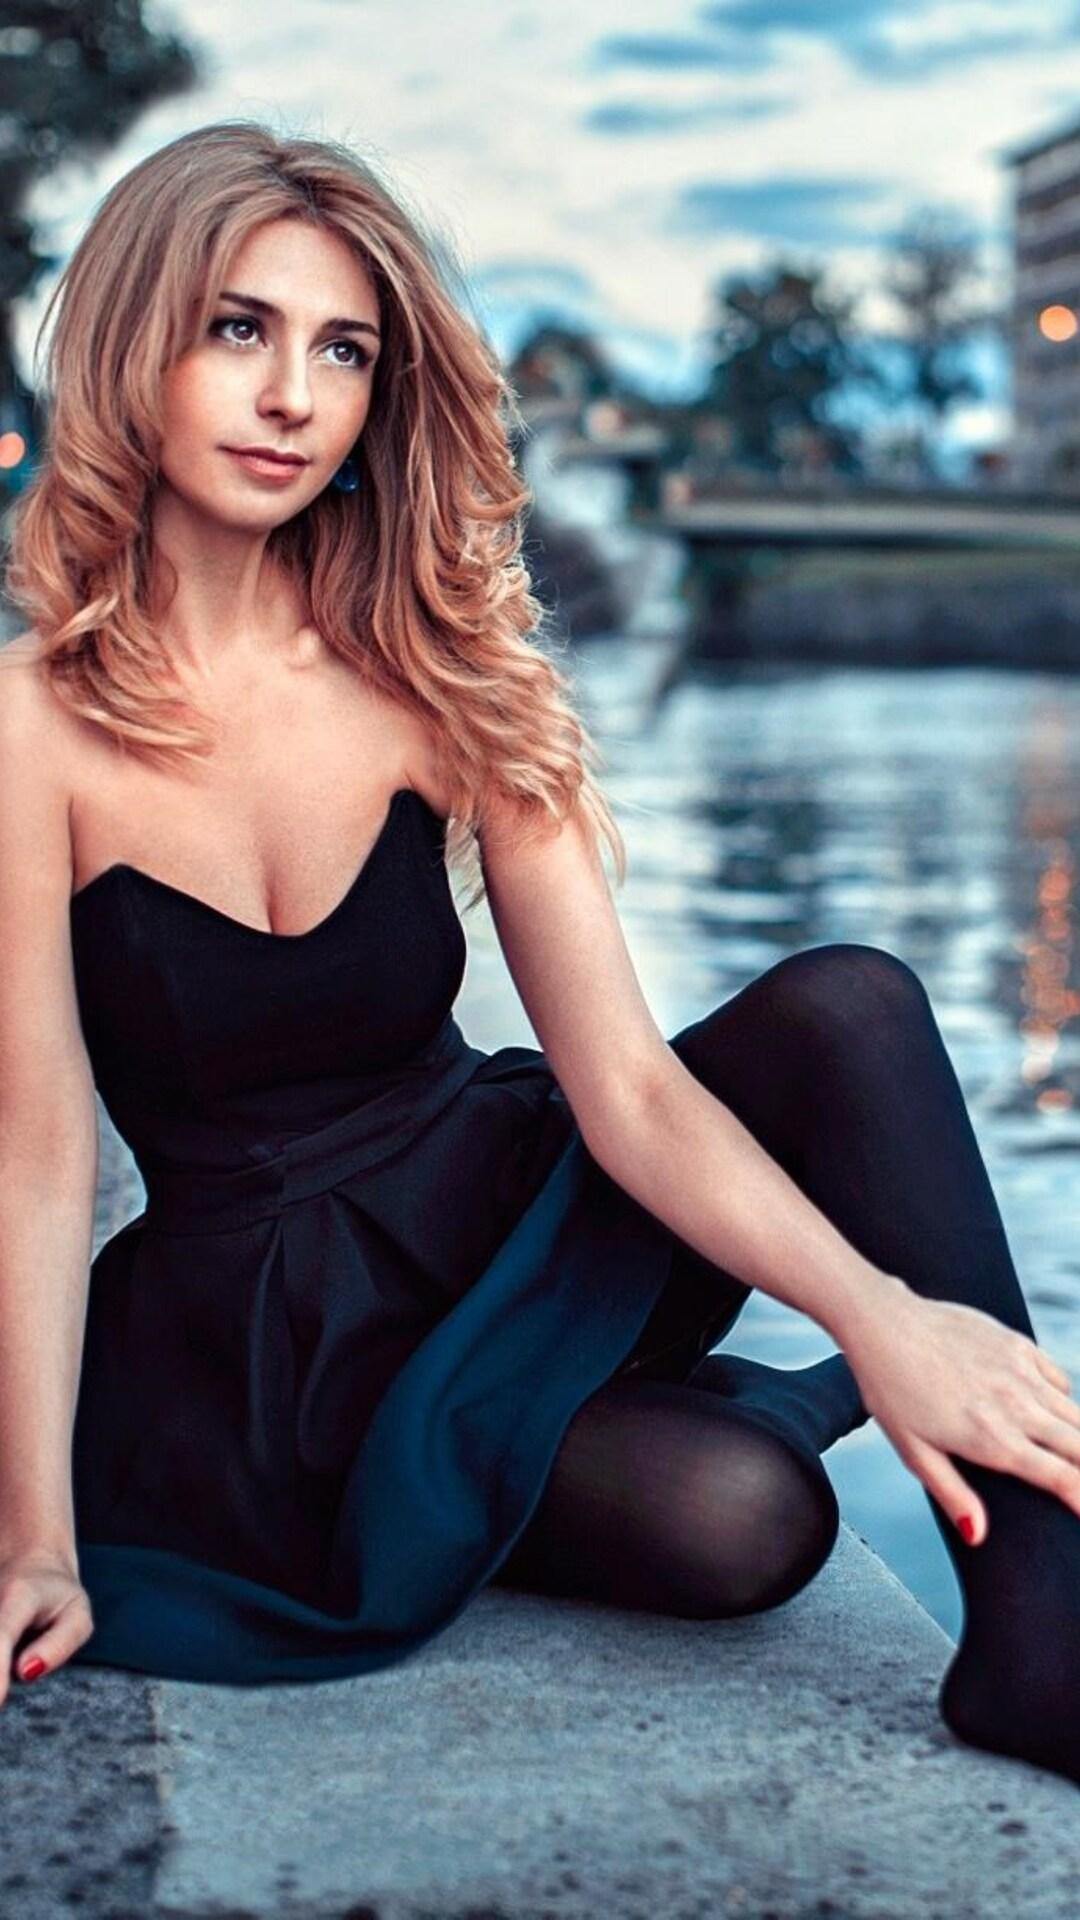 Brunette, woman, beautiful, stare, 1080x1920 wallpaper